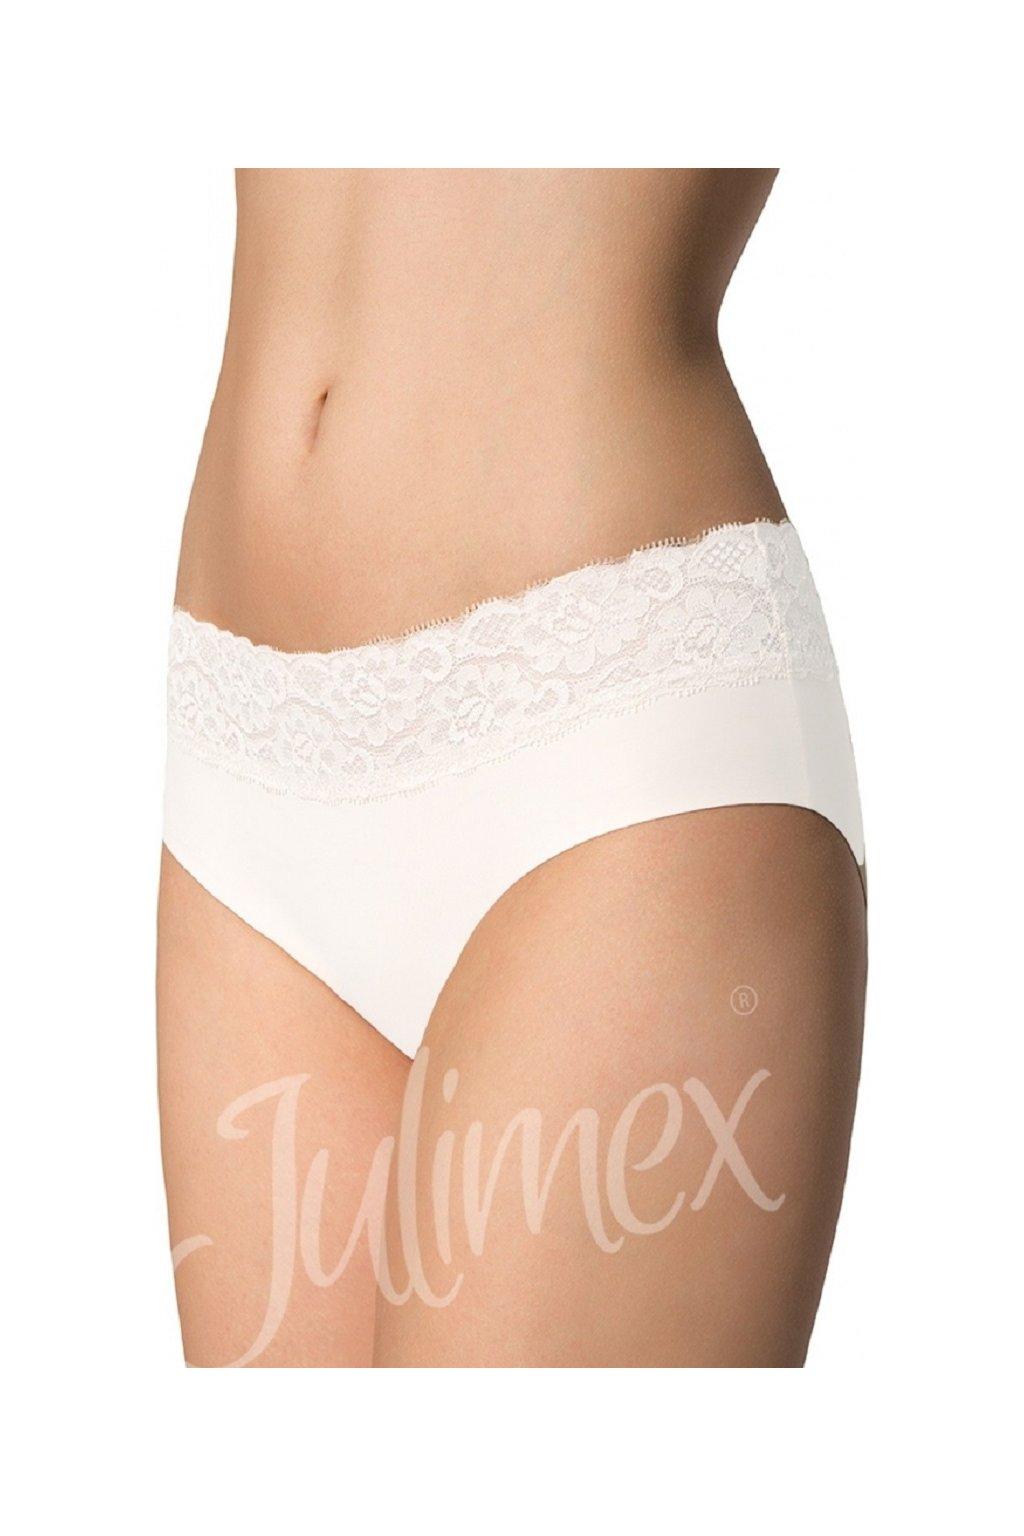 Kalhotky Julimex Hipster Bílá